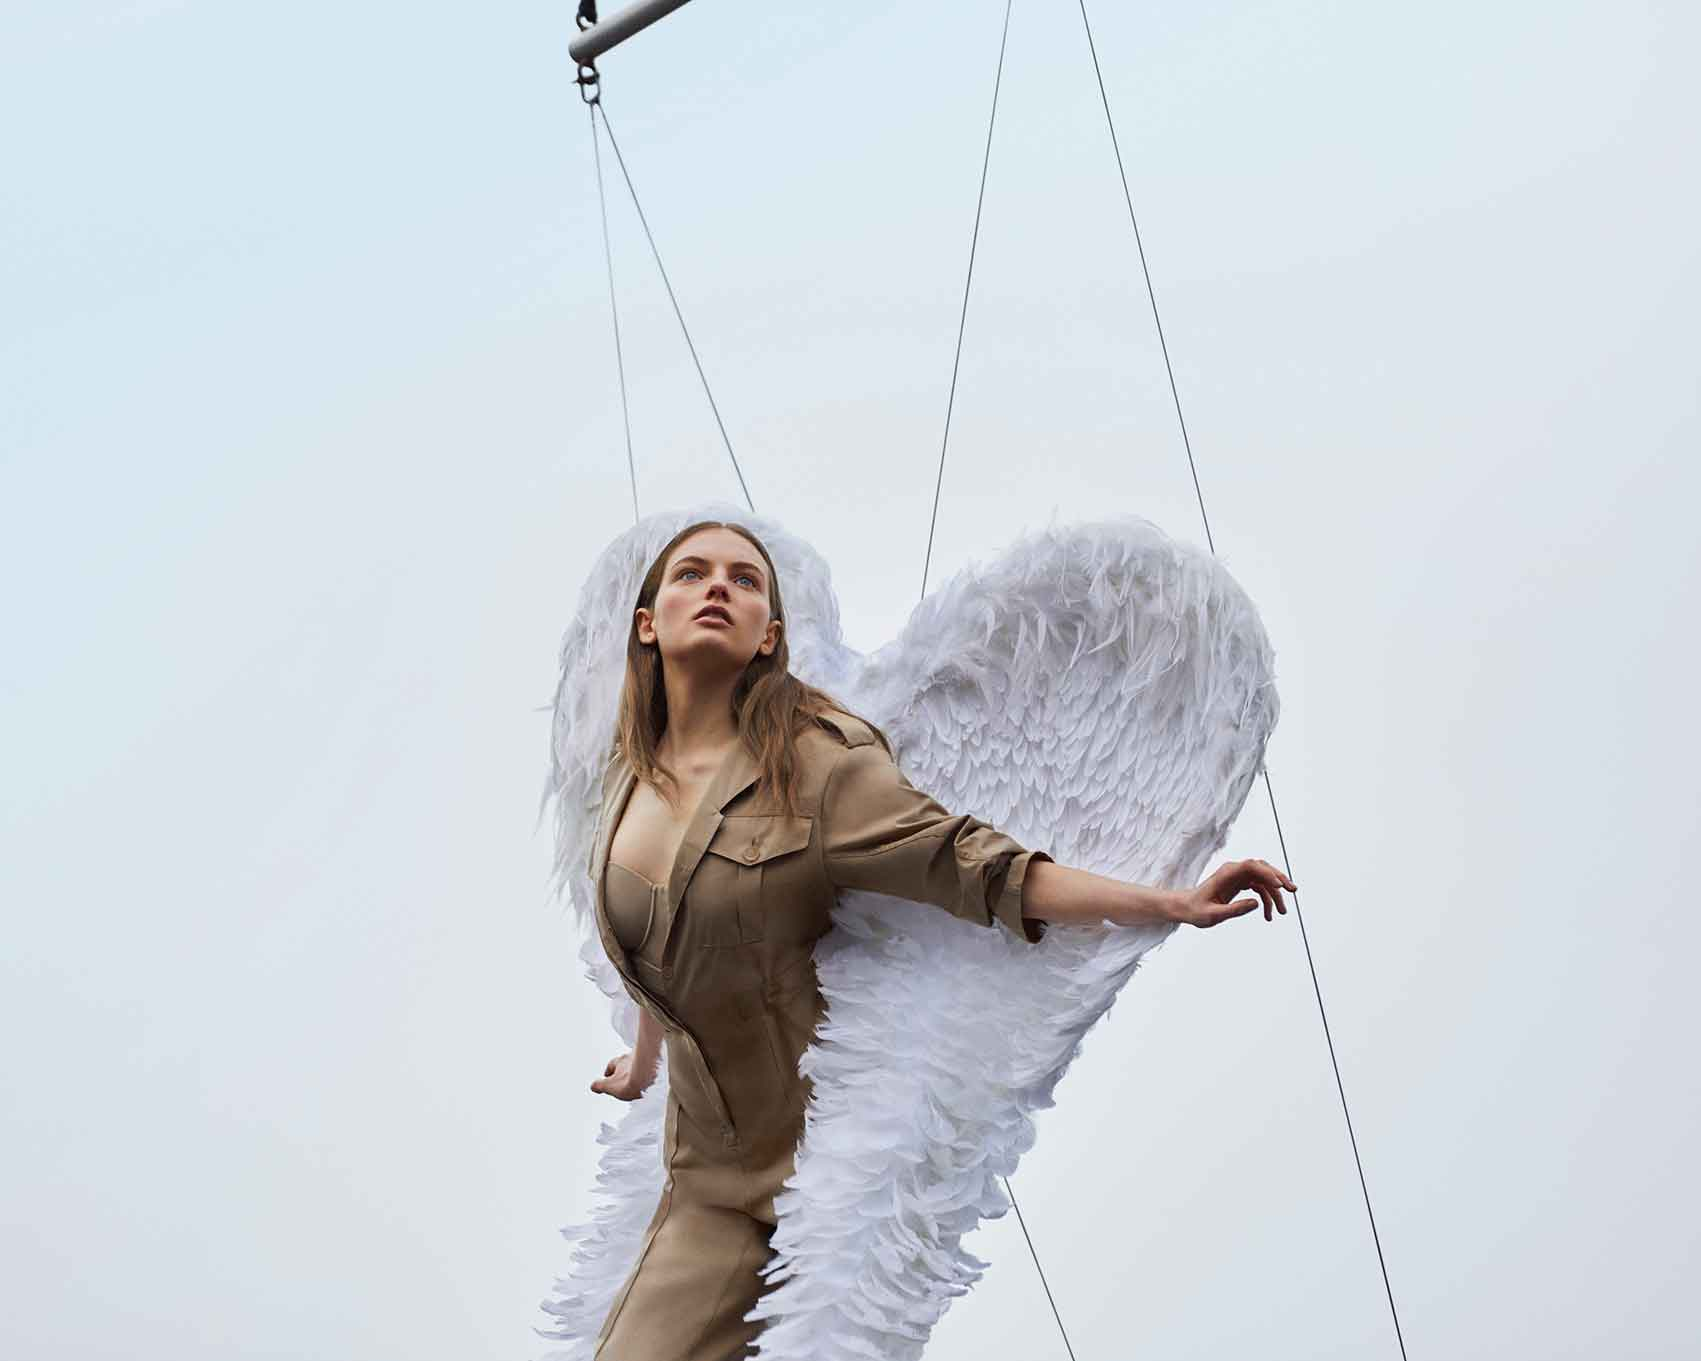 Fran-Summers-Burberry-Her-פארן-סאמרס-מגזין-אופנה-דיגטלי